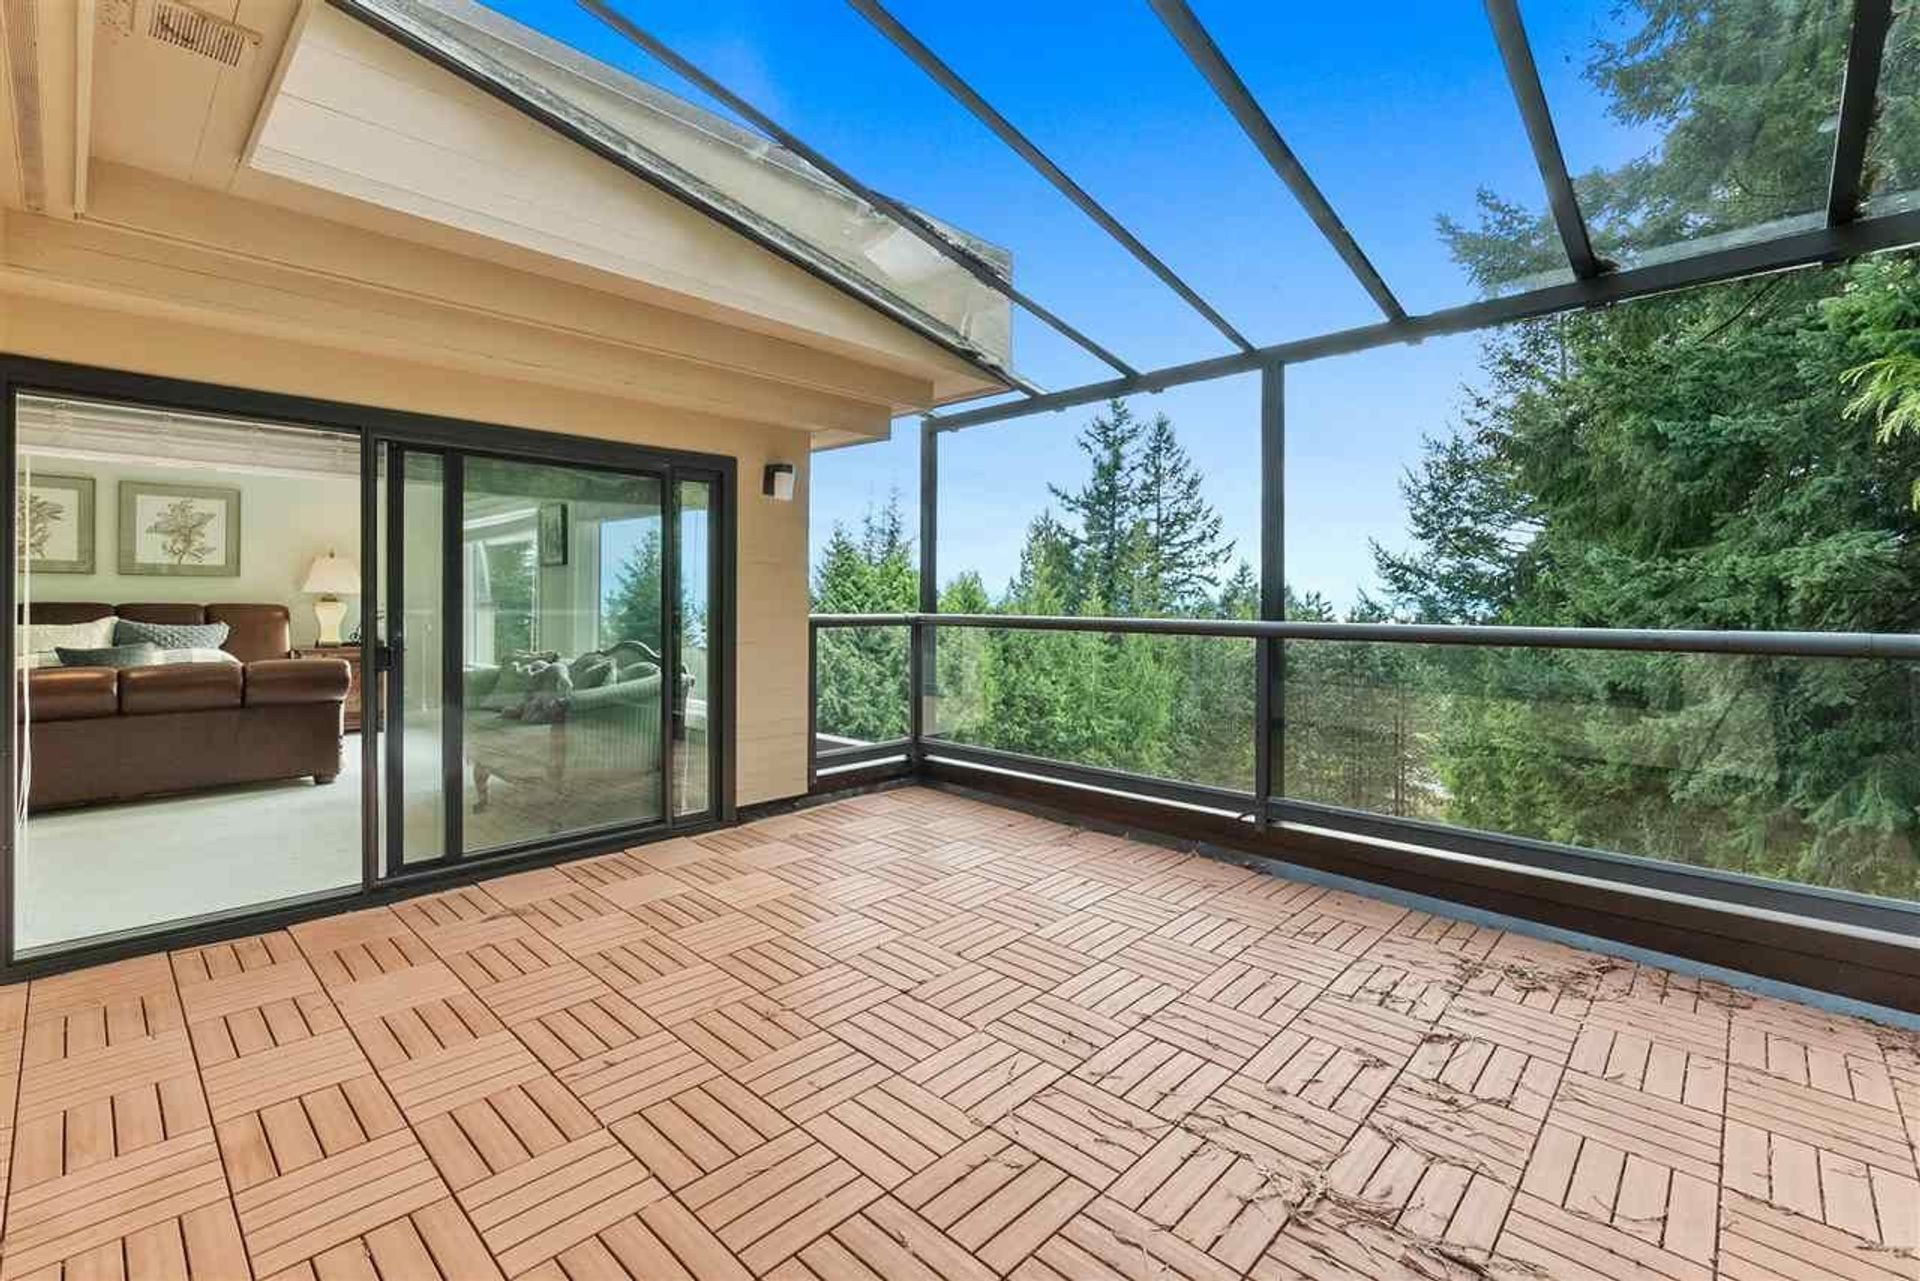 4556-woodgreen-drive-cypress-park-estates-west-vancouver-21 at 4556 Woodgreen Drive, Cypress Park Estates, West Vancouver